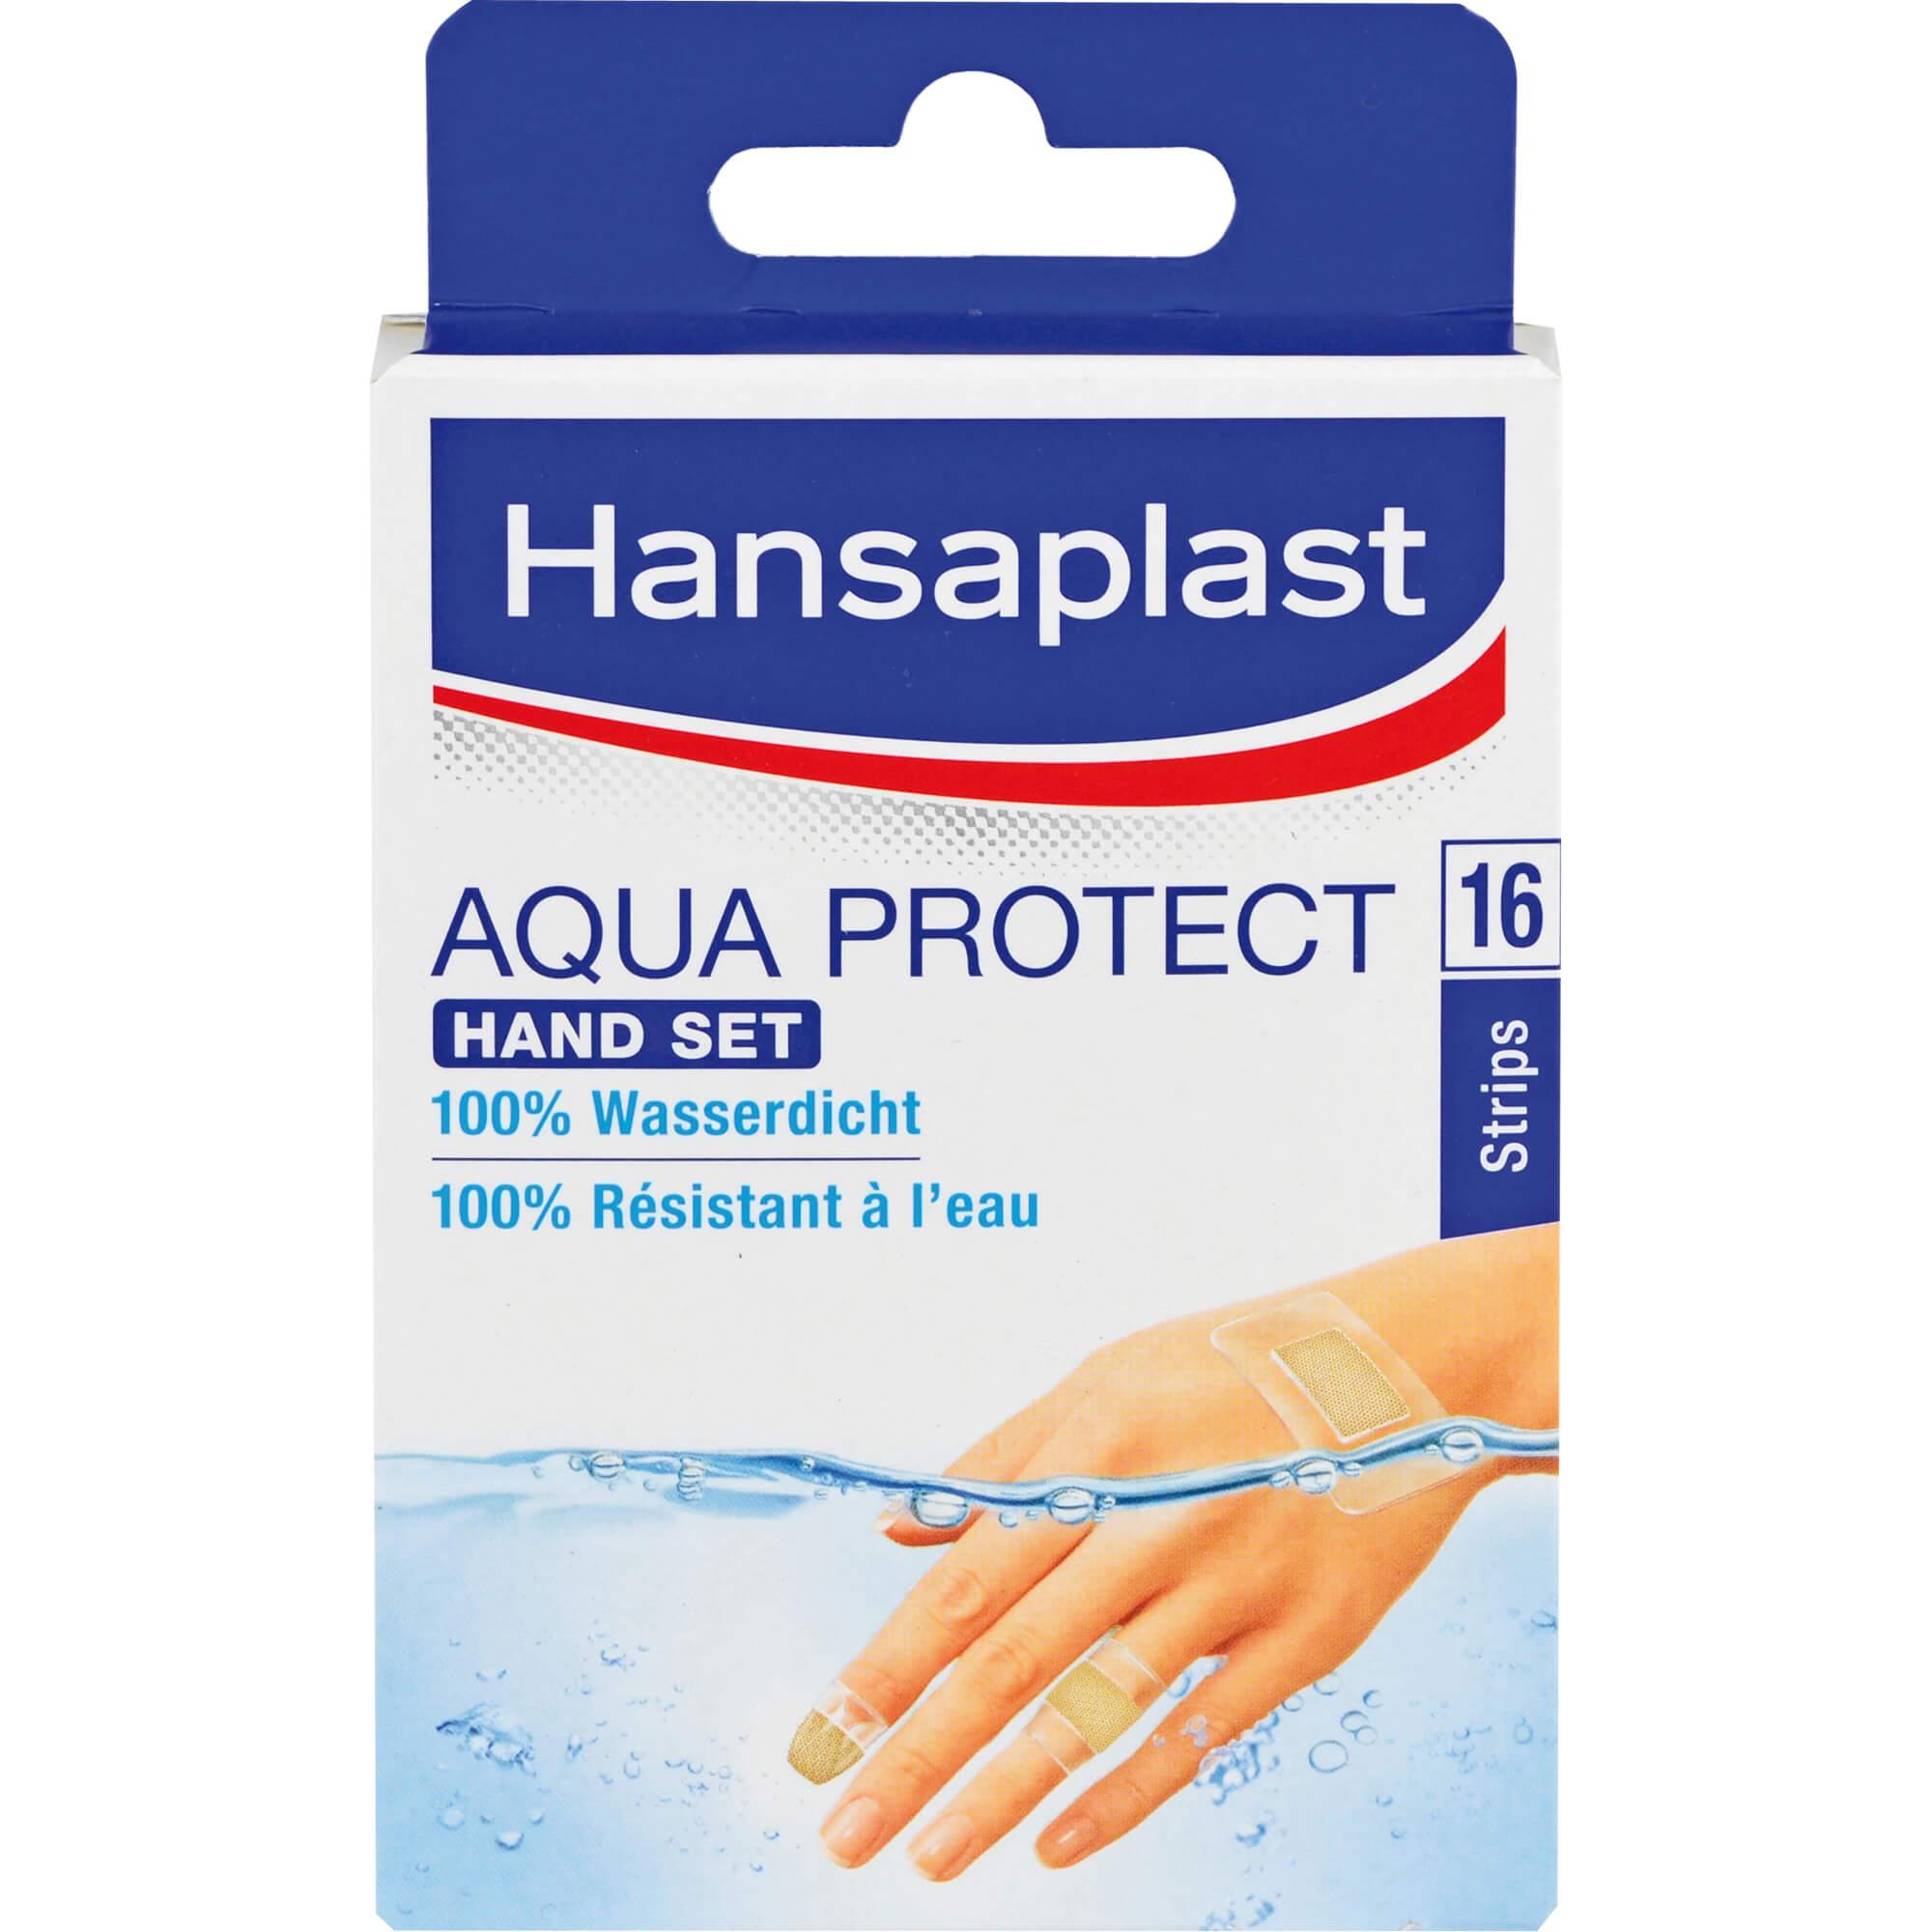 HANSAPLAST Aqua Protect Pflaster Hand Set